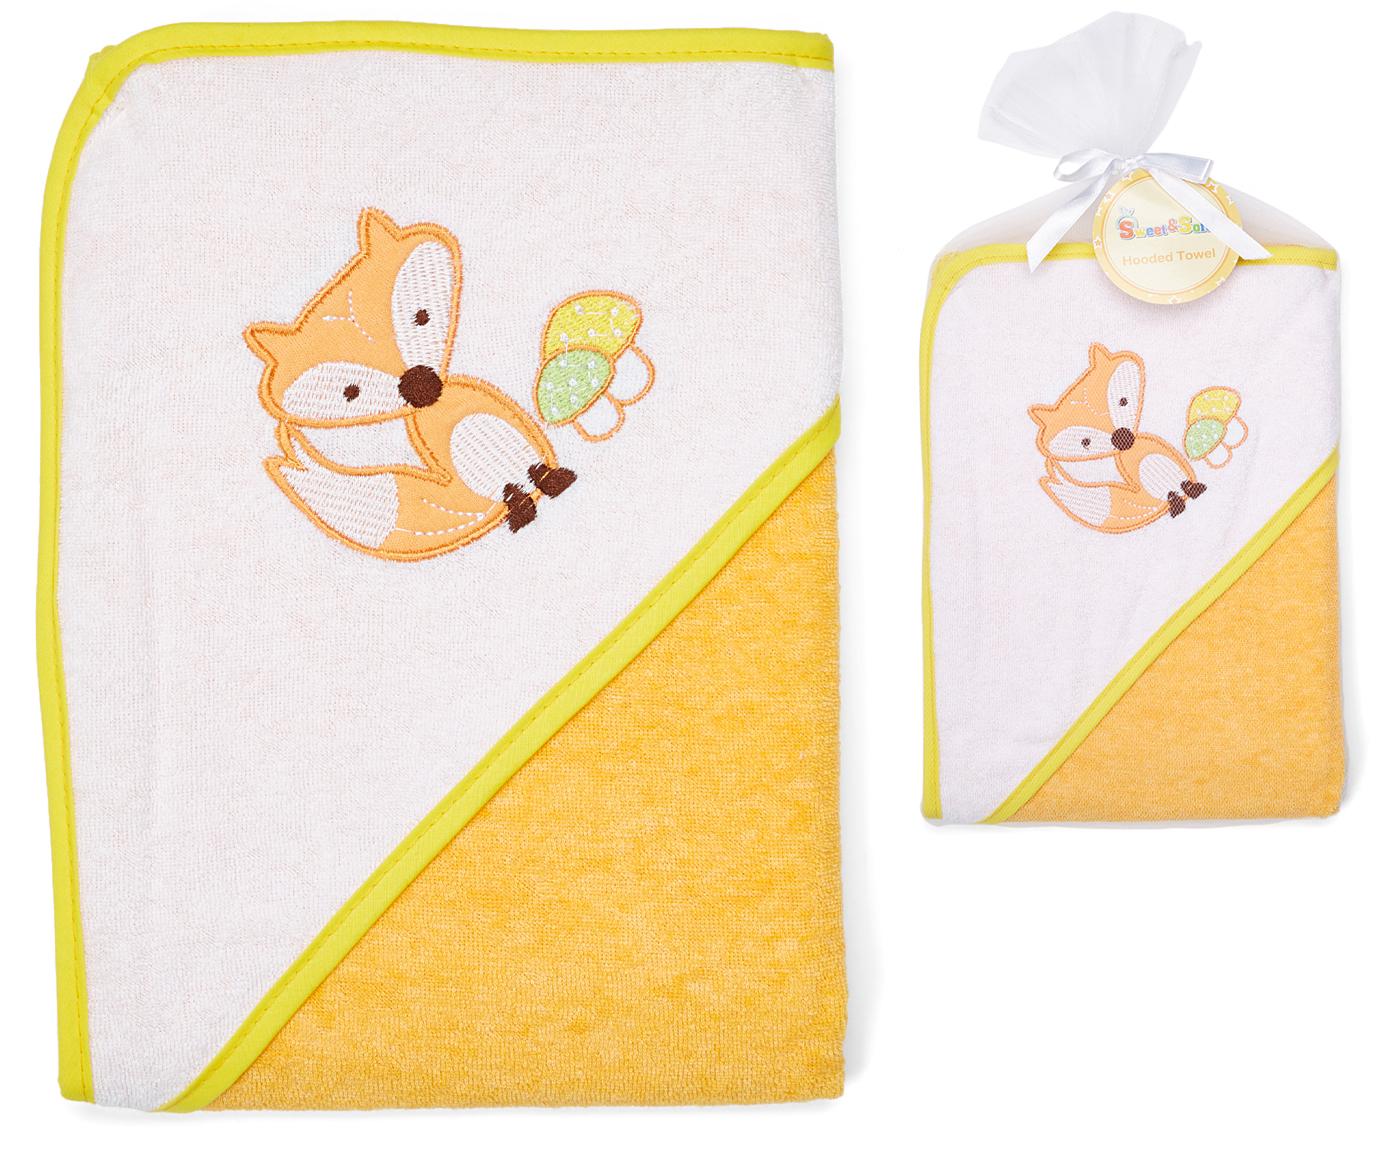 Hooded Baby TOWELs w/ Mesh Bag - 30'' x 30''